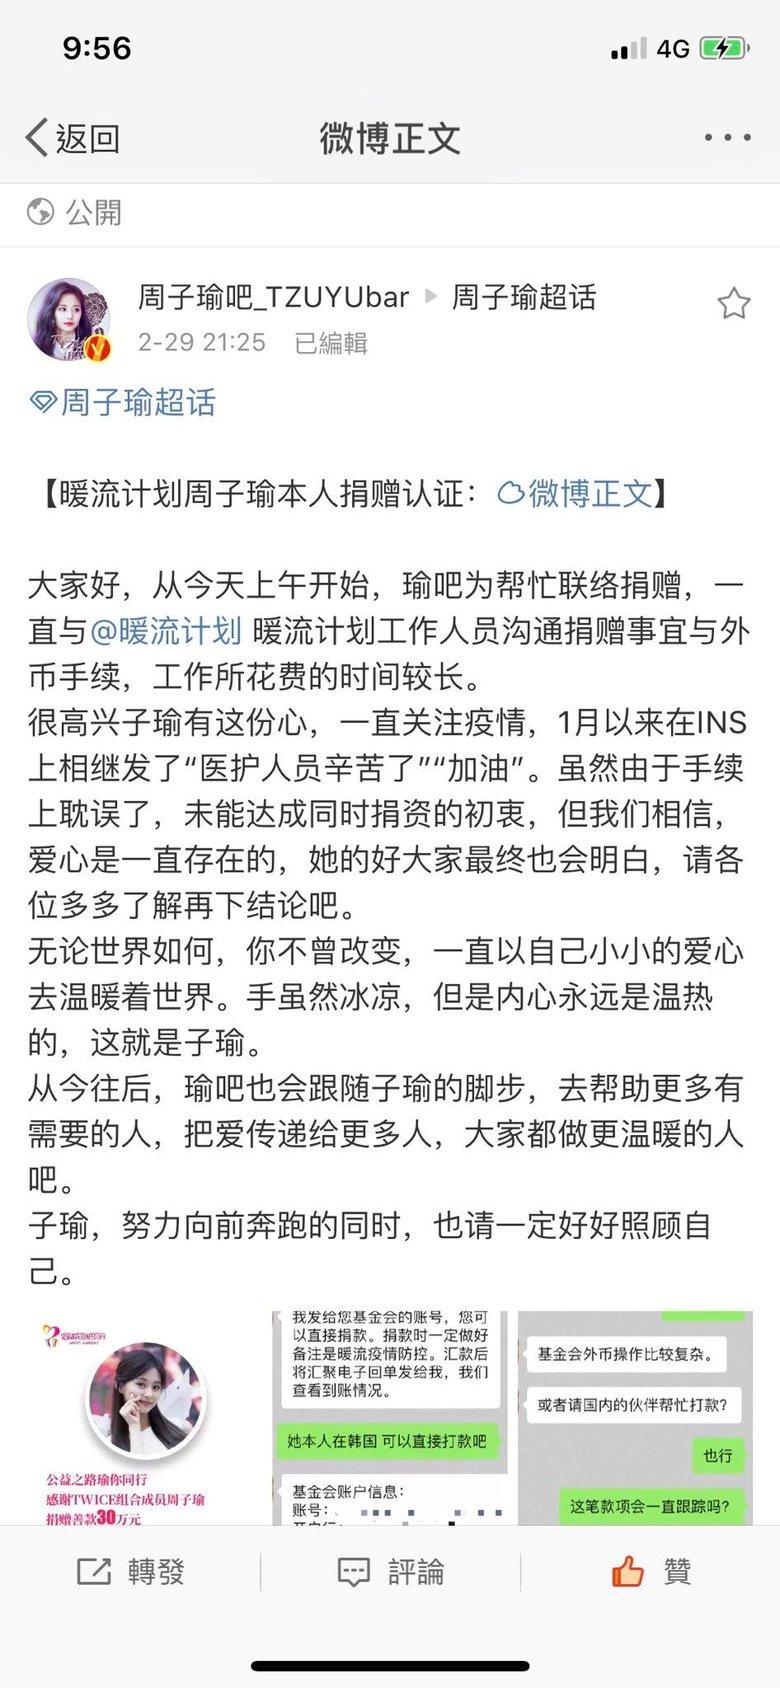 TWICE Tzuyu Criticized For Making Donation To S. Korea